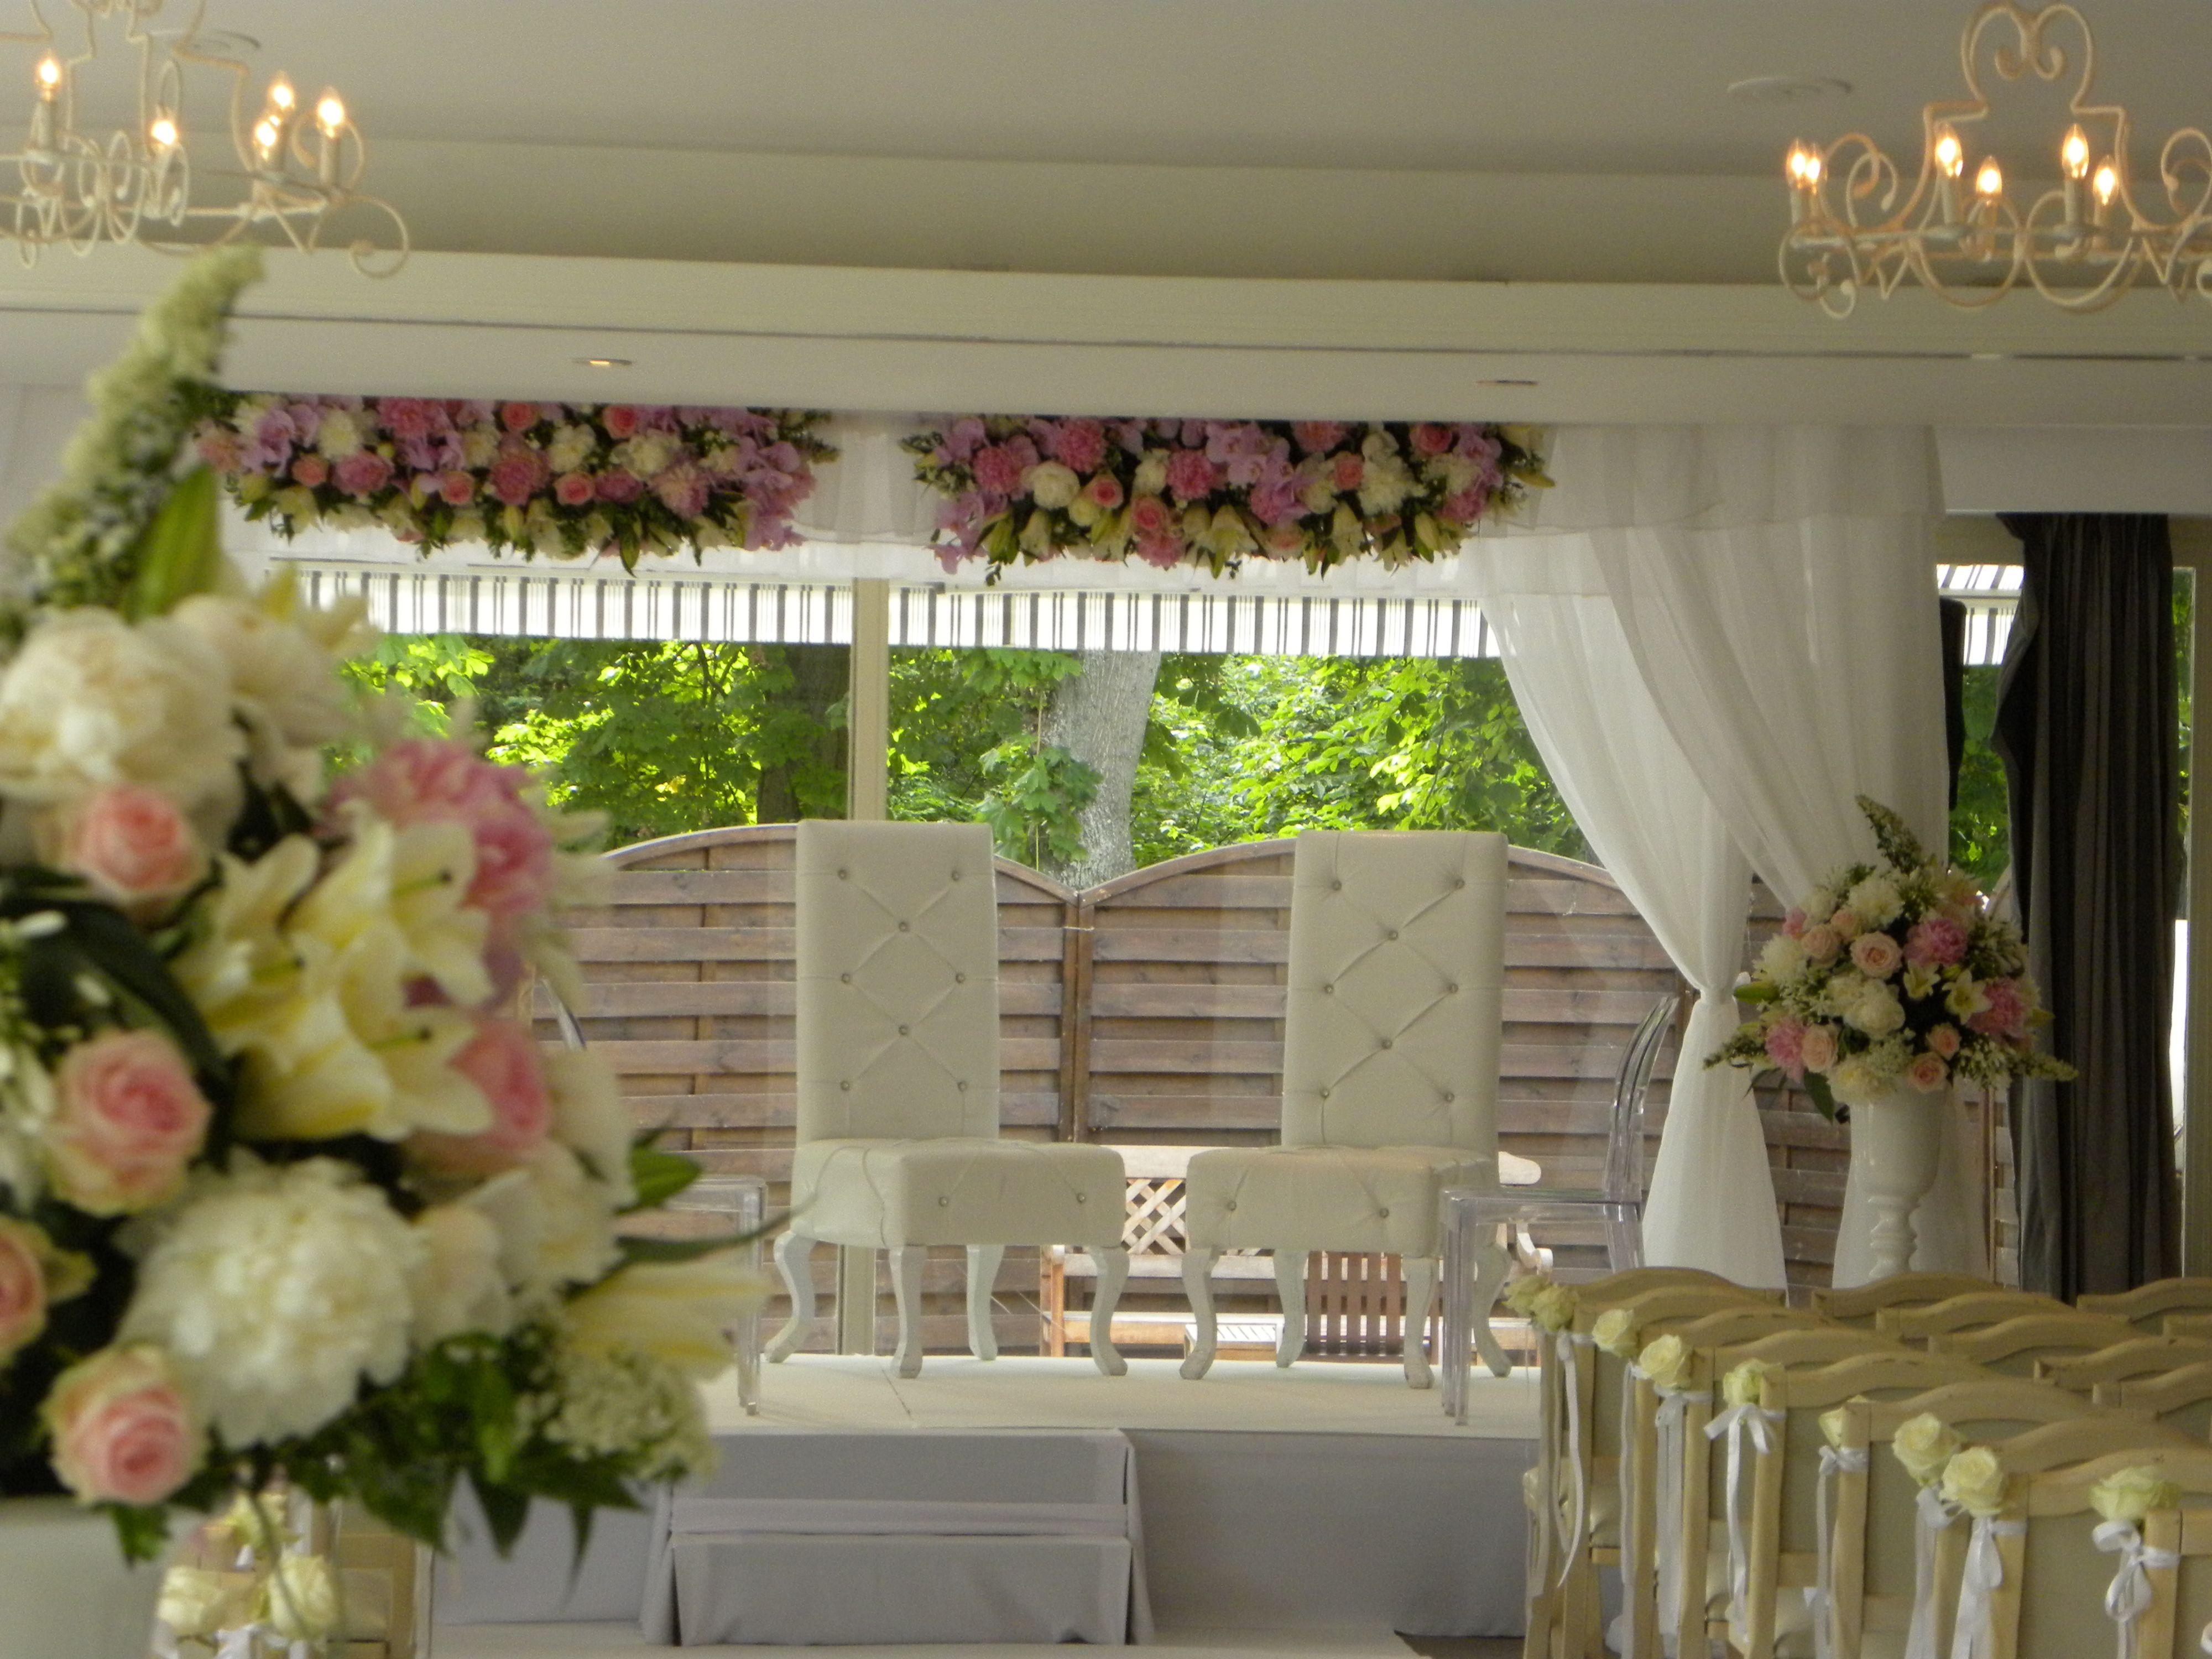 chuppah for the interfaith jewish wedding of cyrielle aurlien houpa lors du mariage mixte - Wedding Planner Mariage Mixte